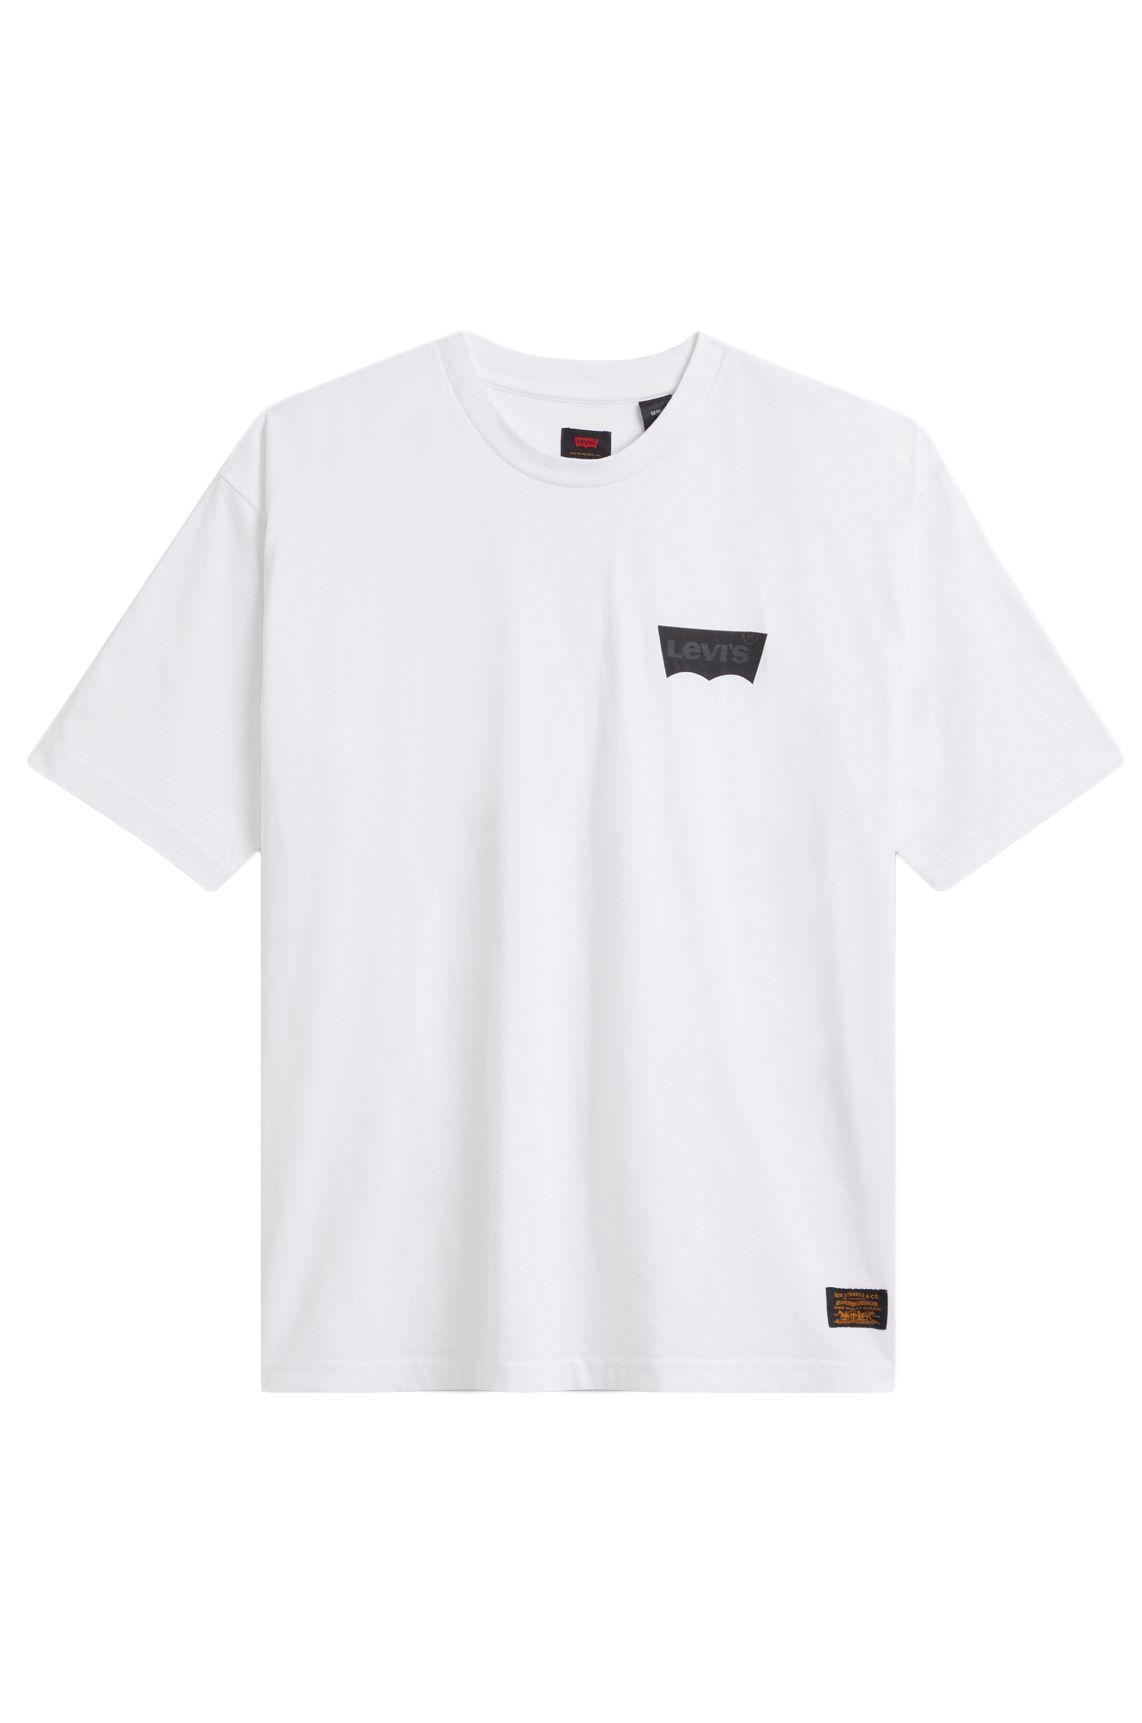 T-Shirt Levis SKATE GRAPHIC BOX Lsc White Core Batwing Black